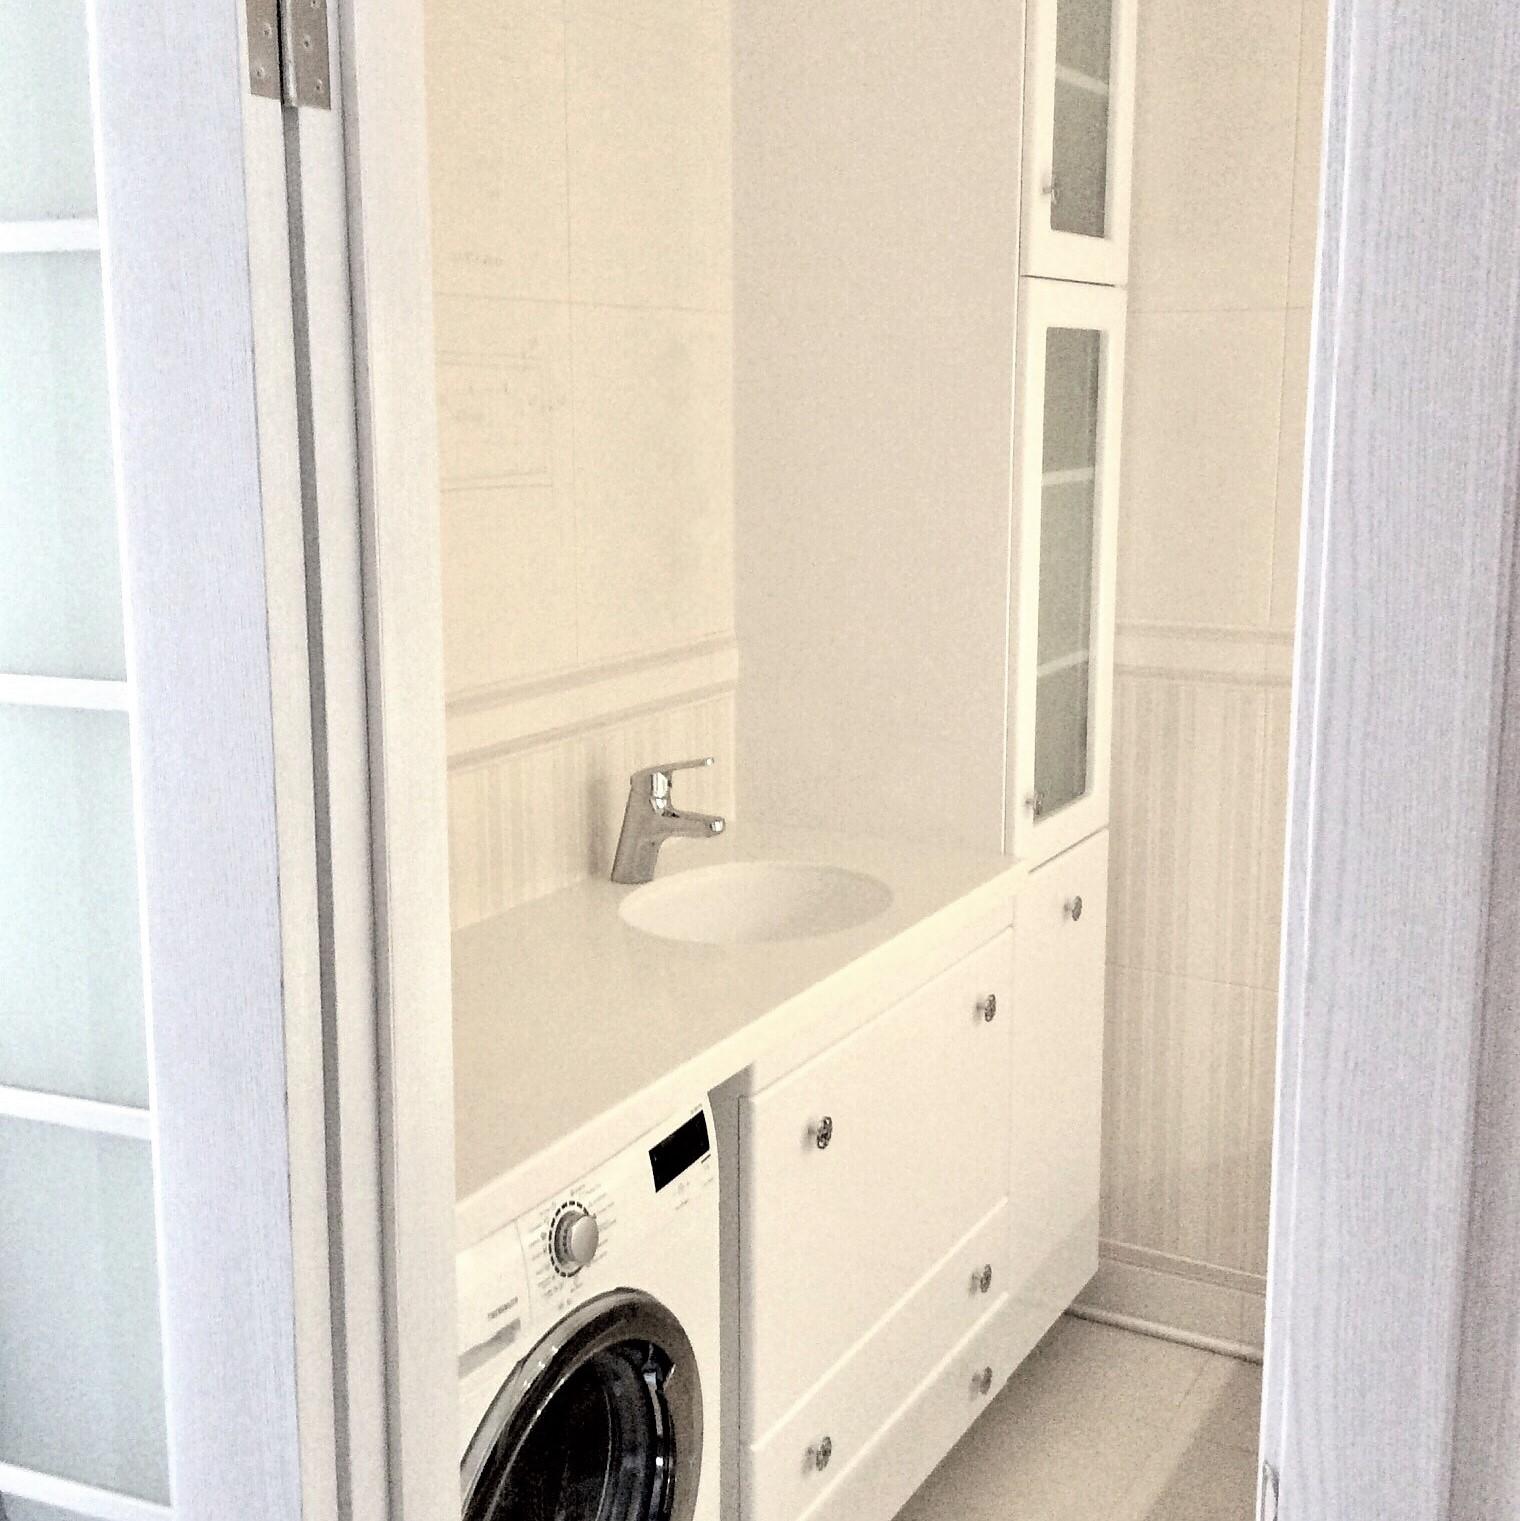 Ванная мебель на заказ - тумба под стиральную машину